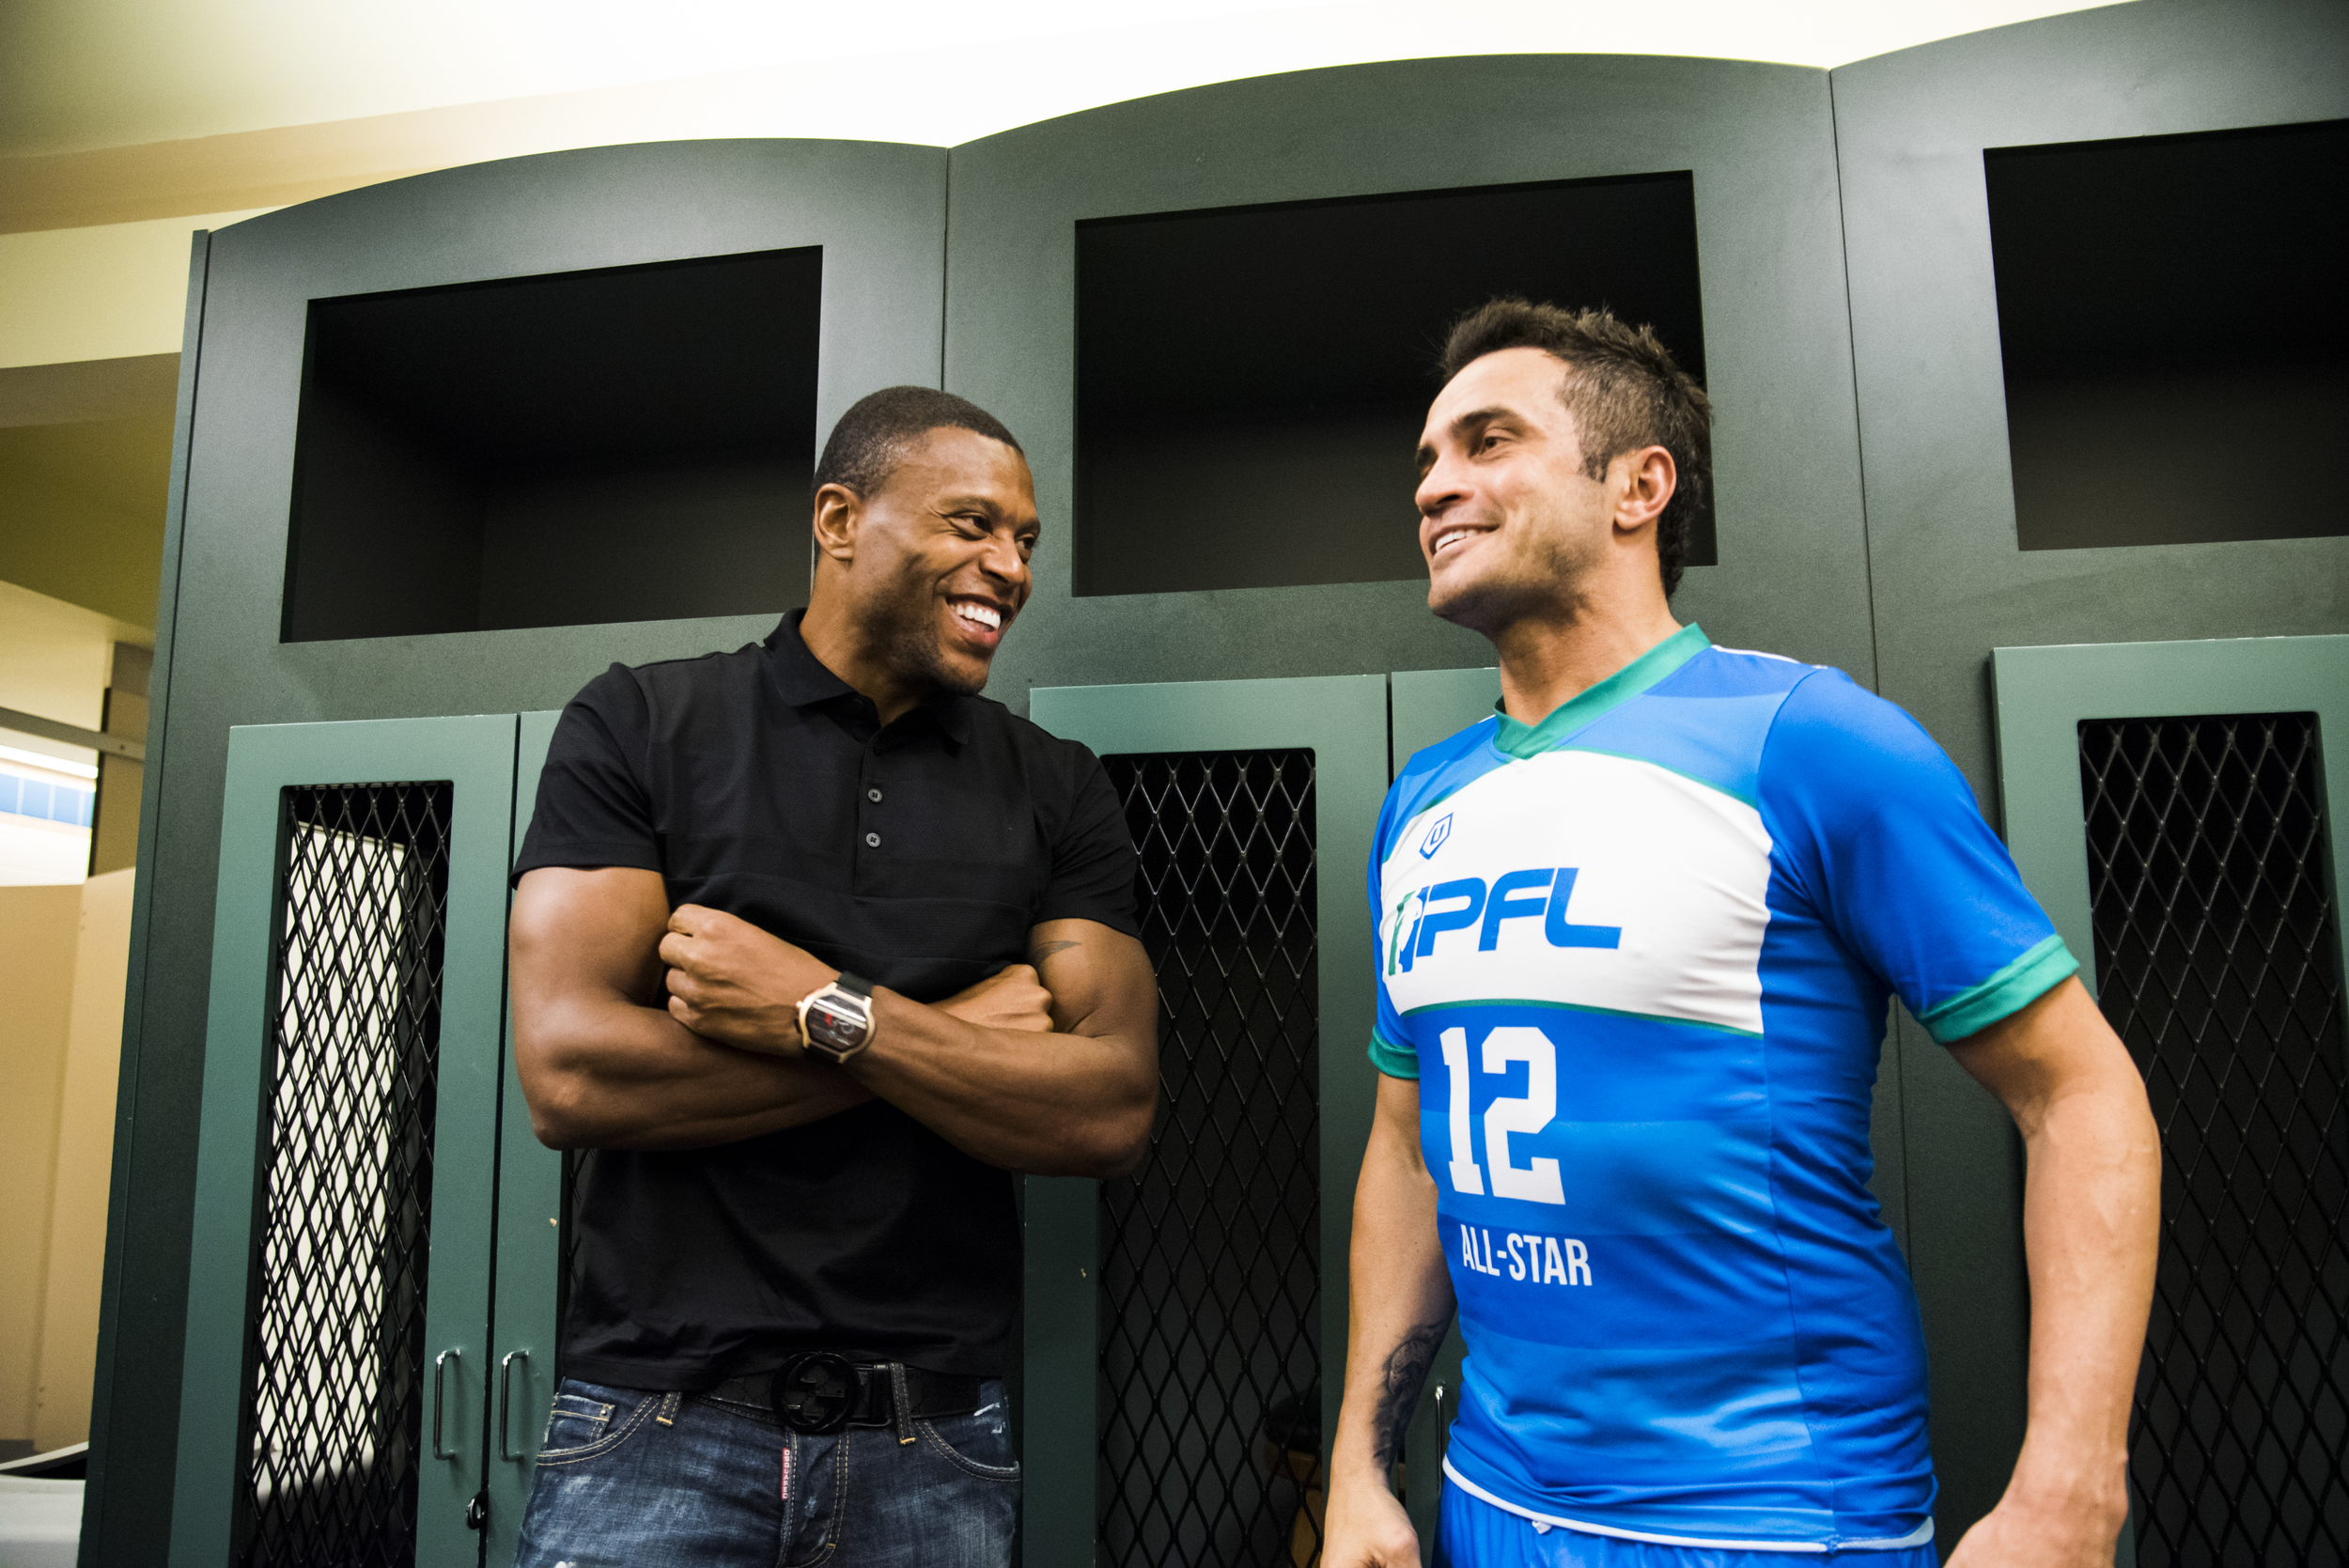 Orlando City's,Júlio Baptista was also there to support his friend Falcão.